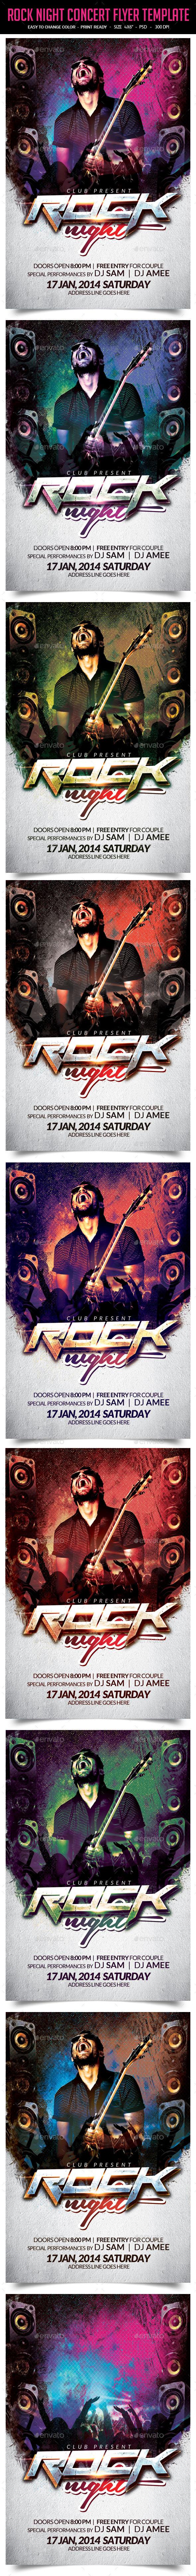 Rock Night Concert Flyer Template - Clubs & Parties Events